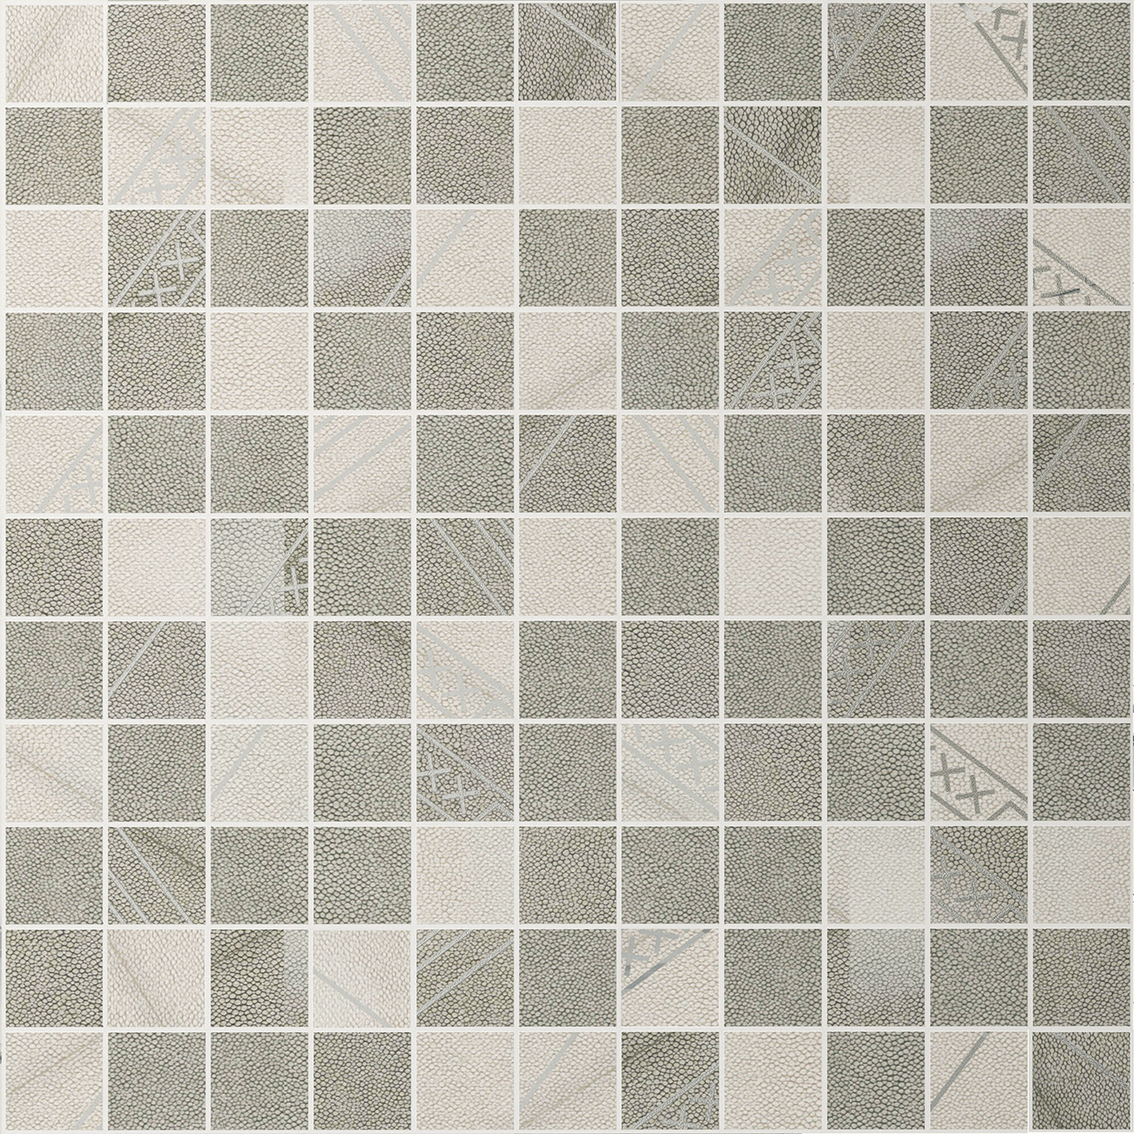 Мозаика Mosaic Stingray Graphite